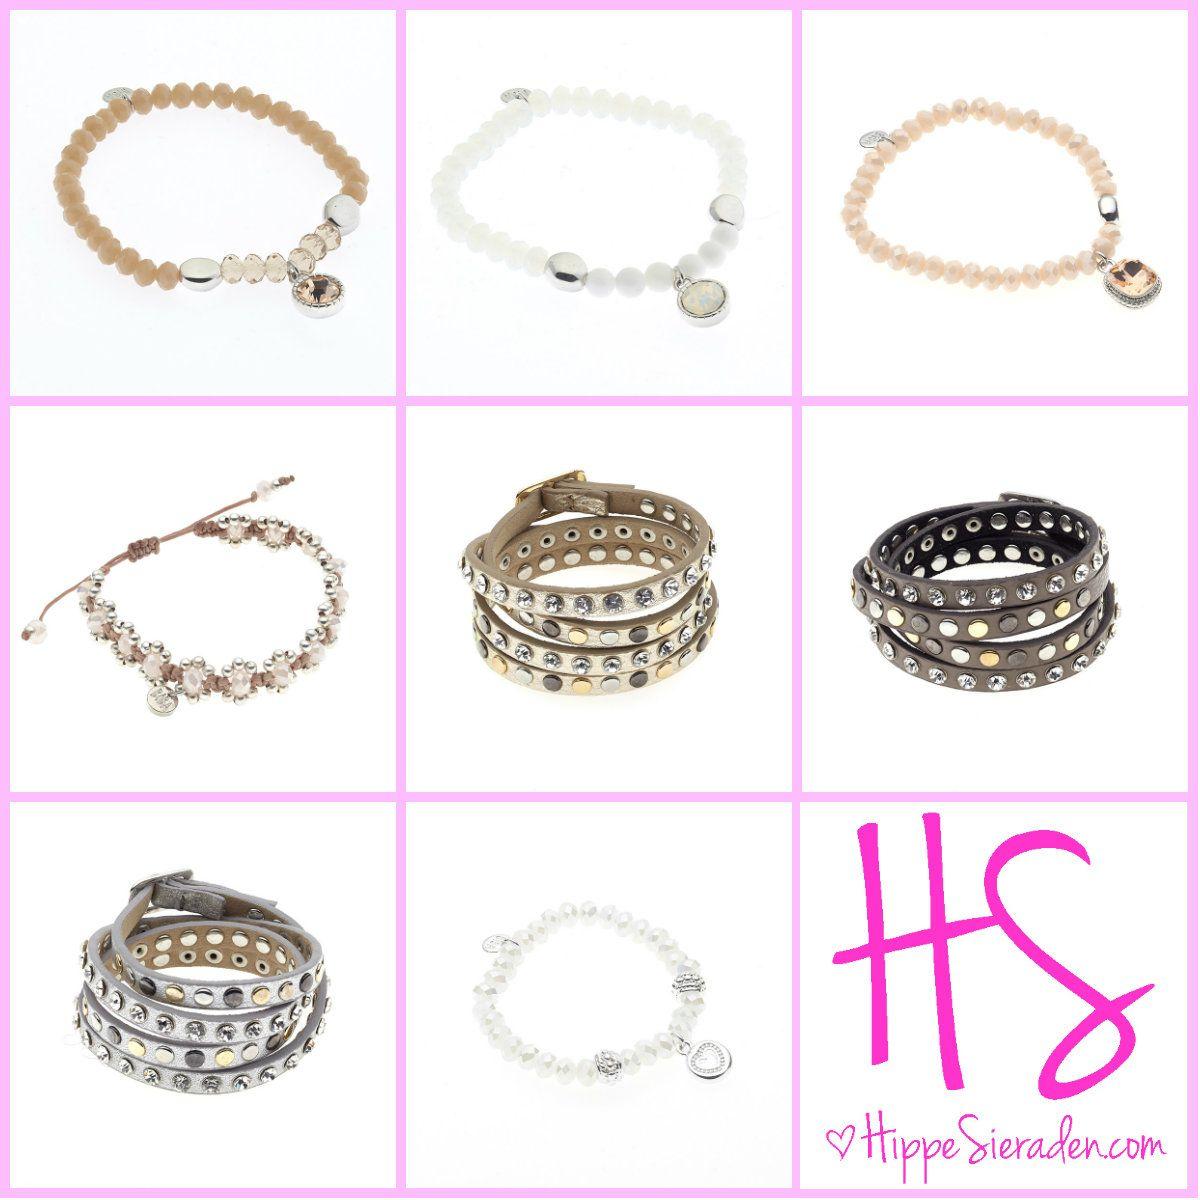 Biba armbanden. HippeSieraden.com